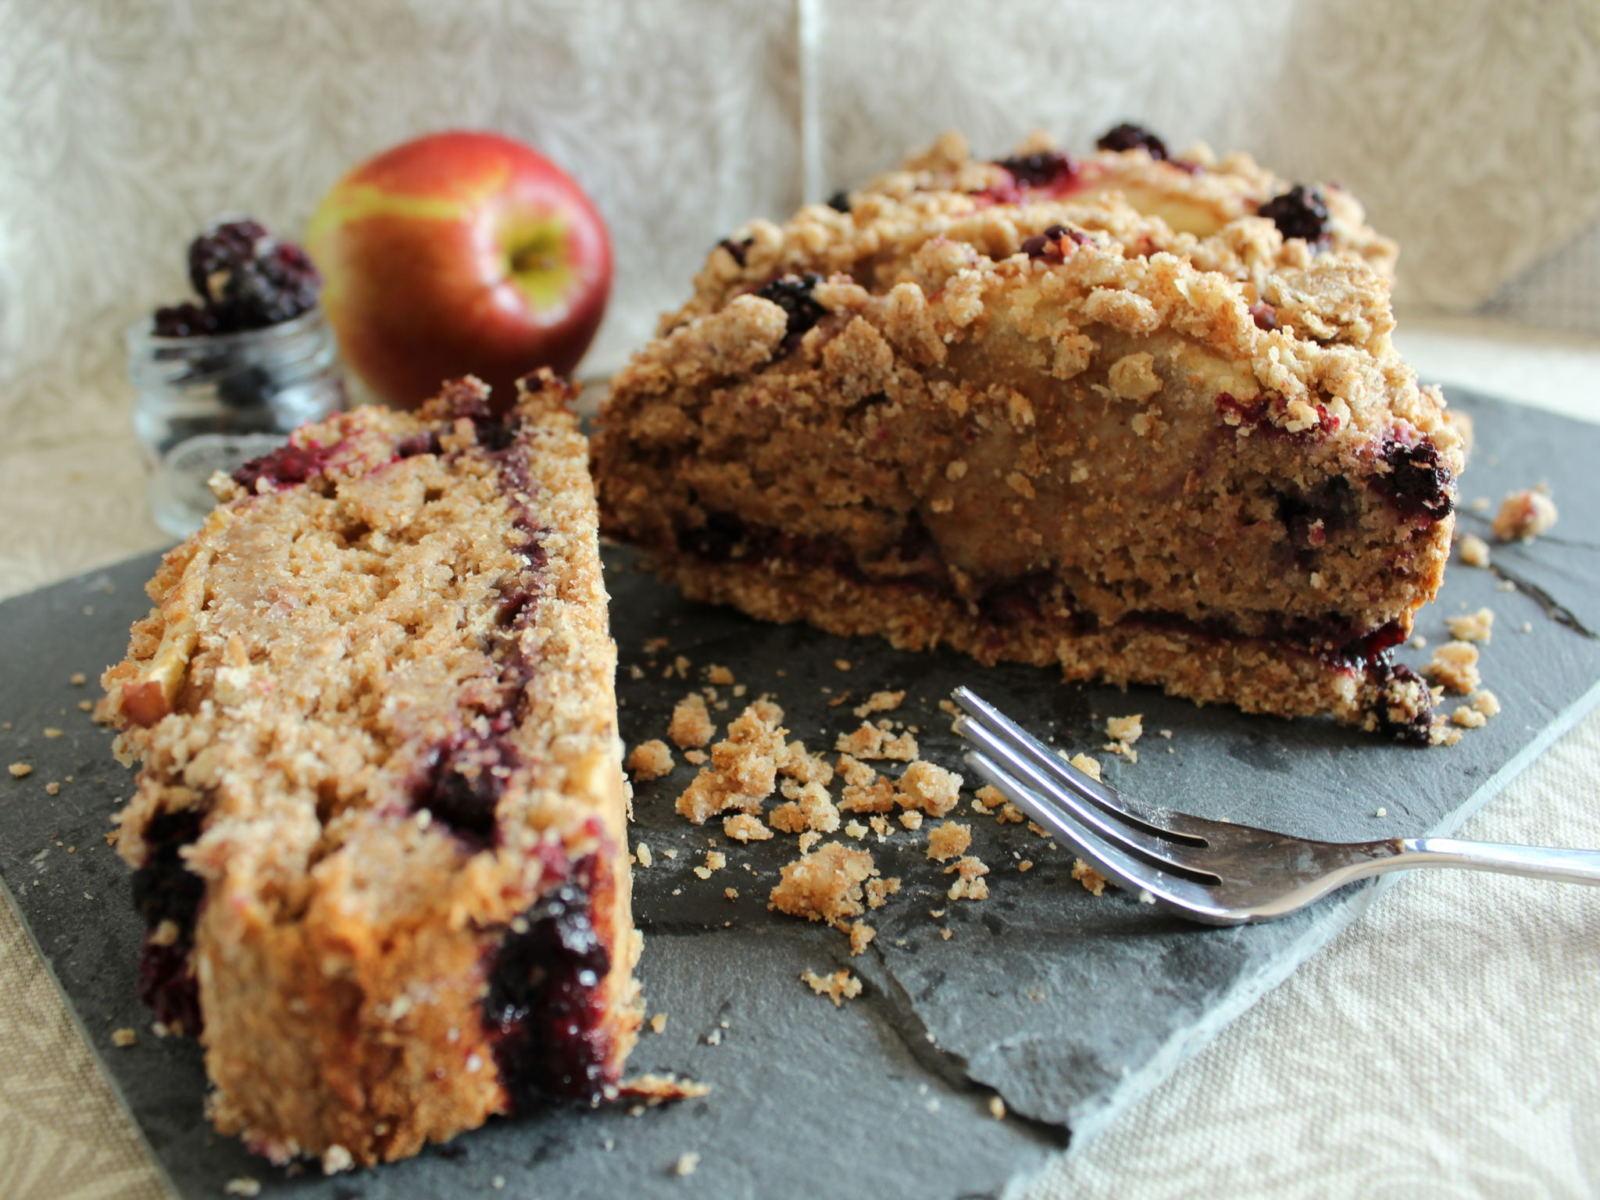 Vegan apple & Blackberry crumble cake